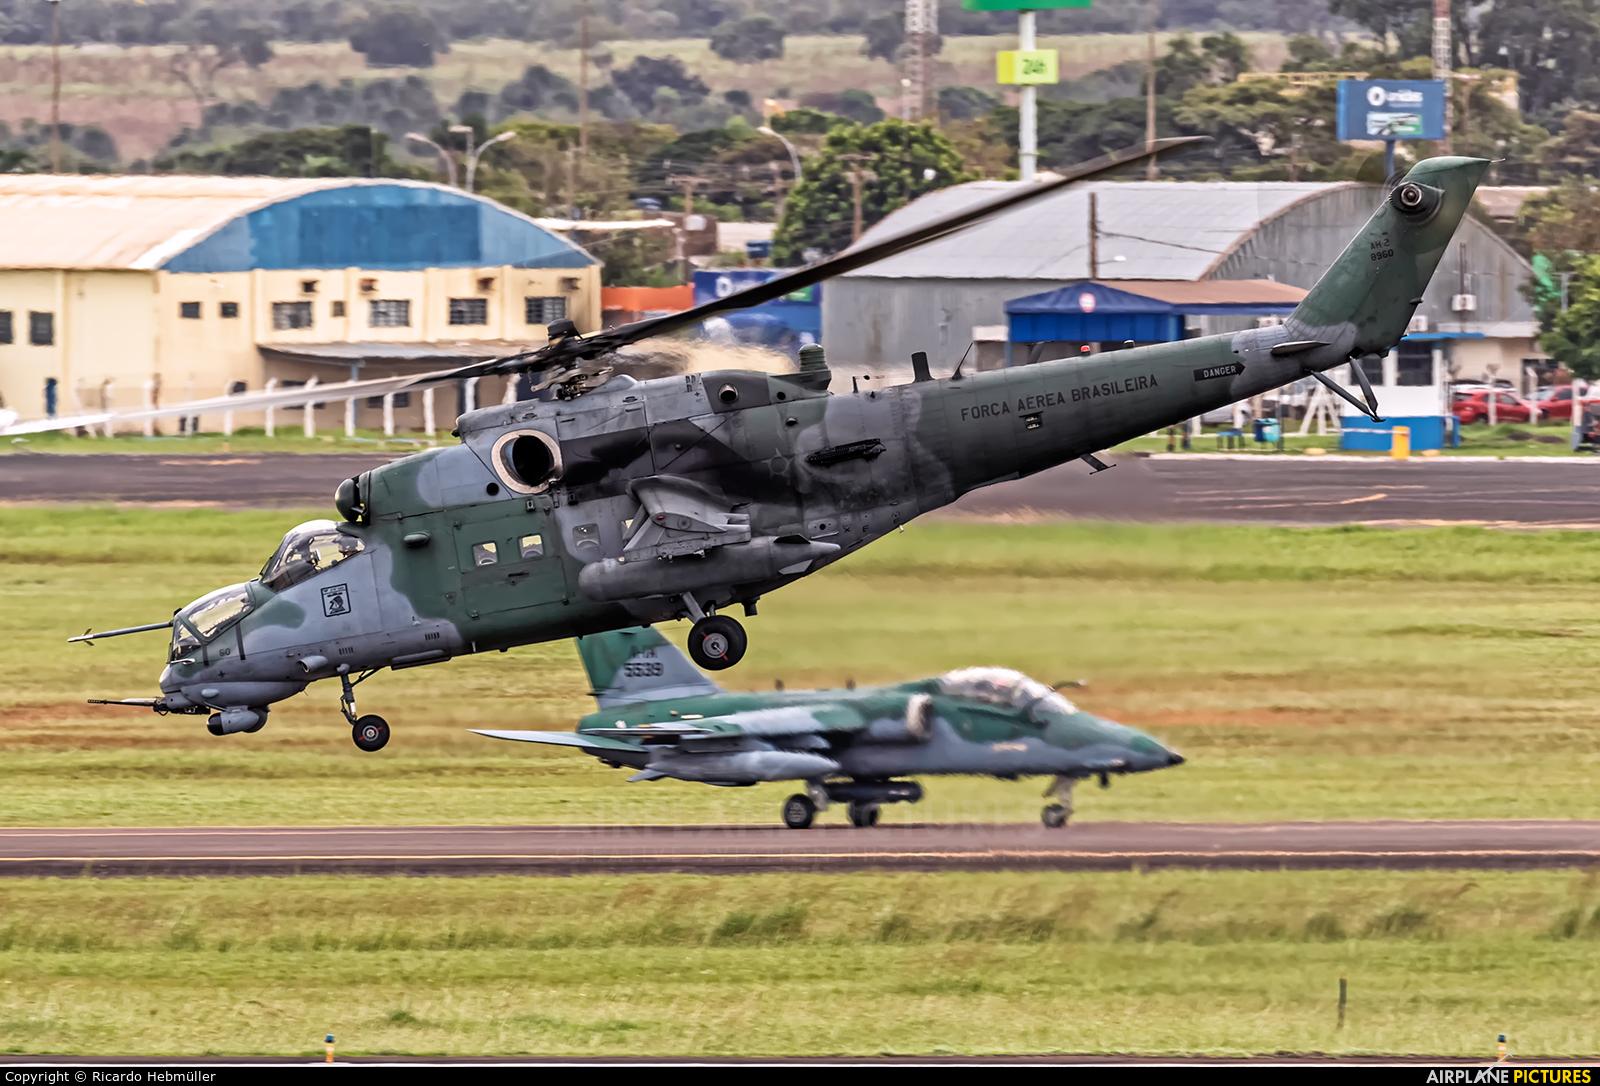 Brazil - Air Force 8960 aircraft at Campo Grande